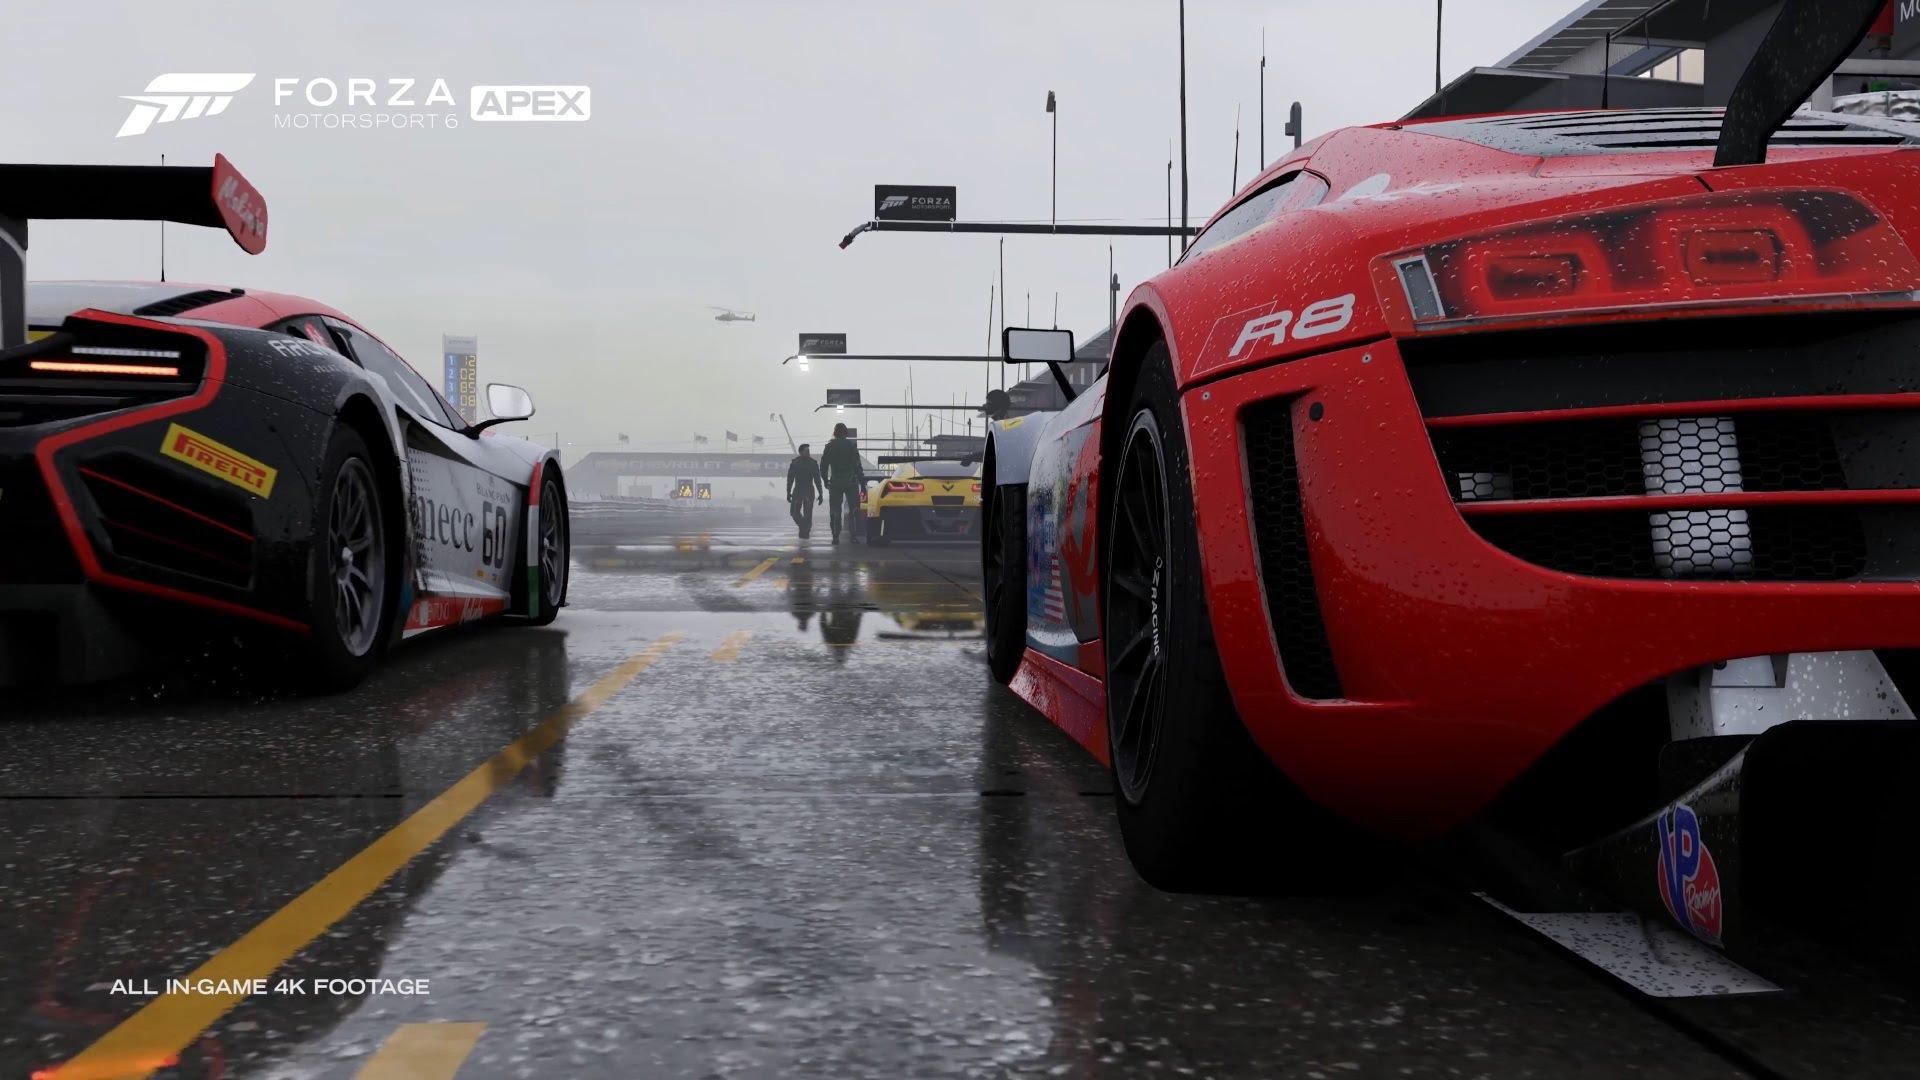 Forza Motorsport 7 Wallpapers Ultra Hd Gaming Backgrounds: Forza Motorsport 6: Apex HD Wallpaper